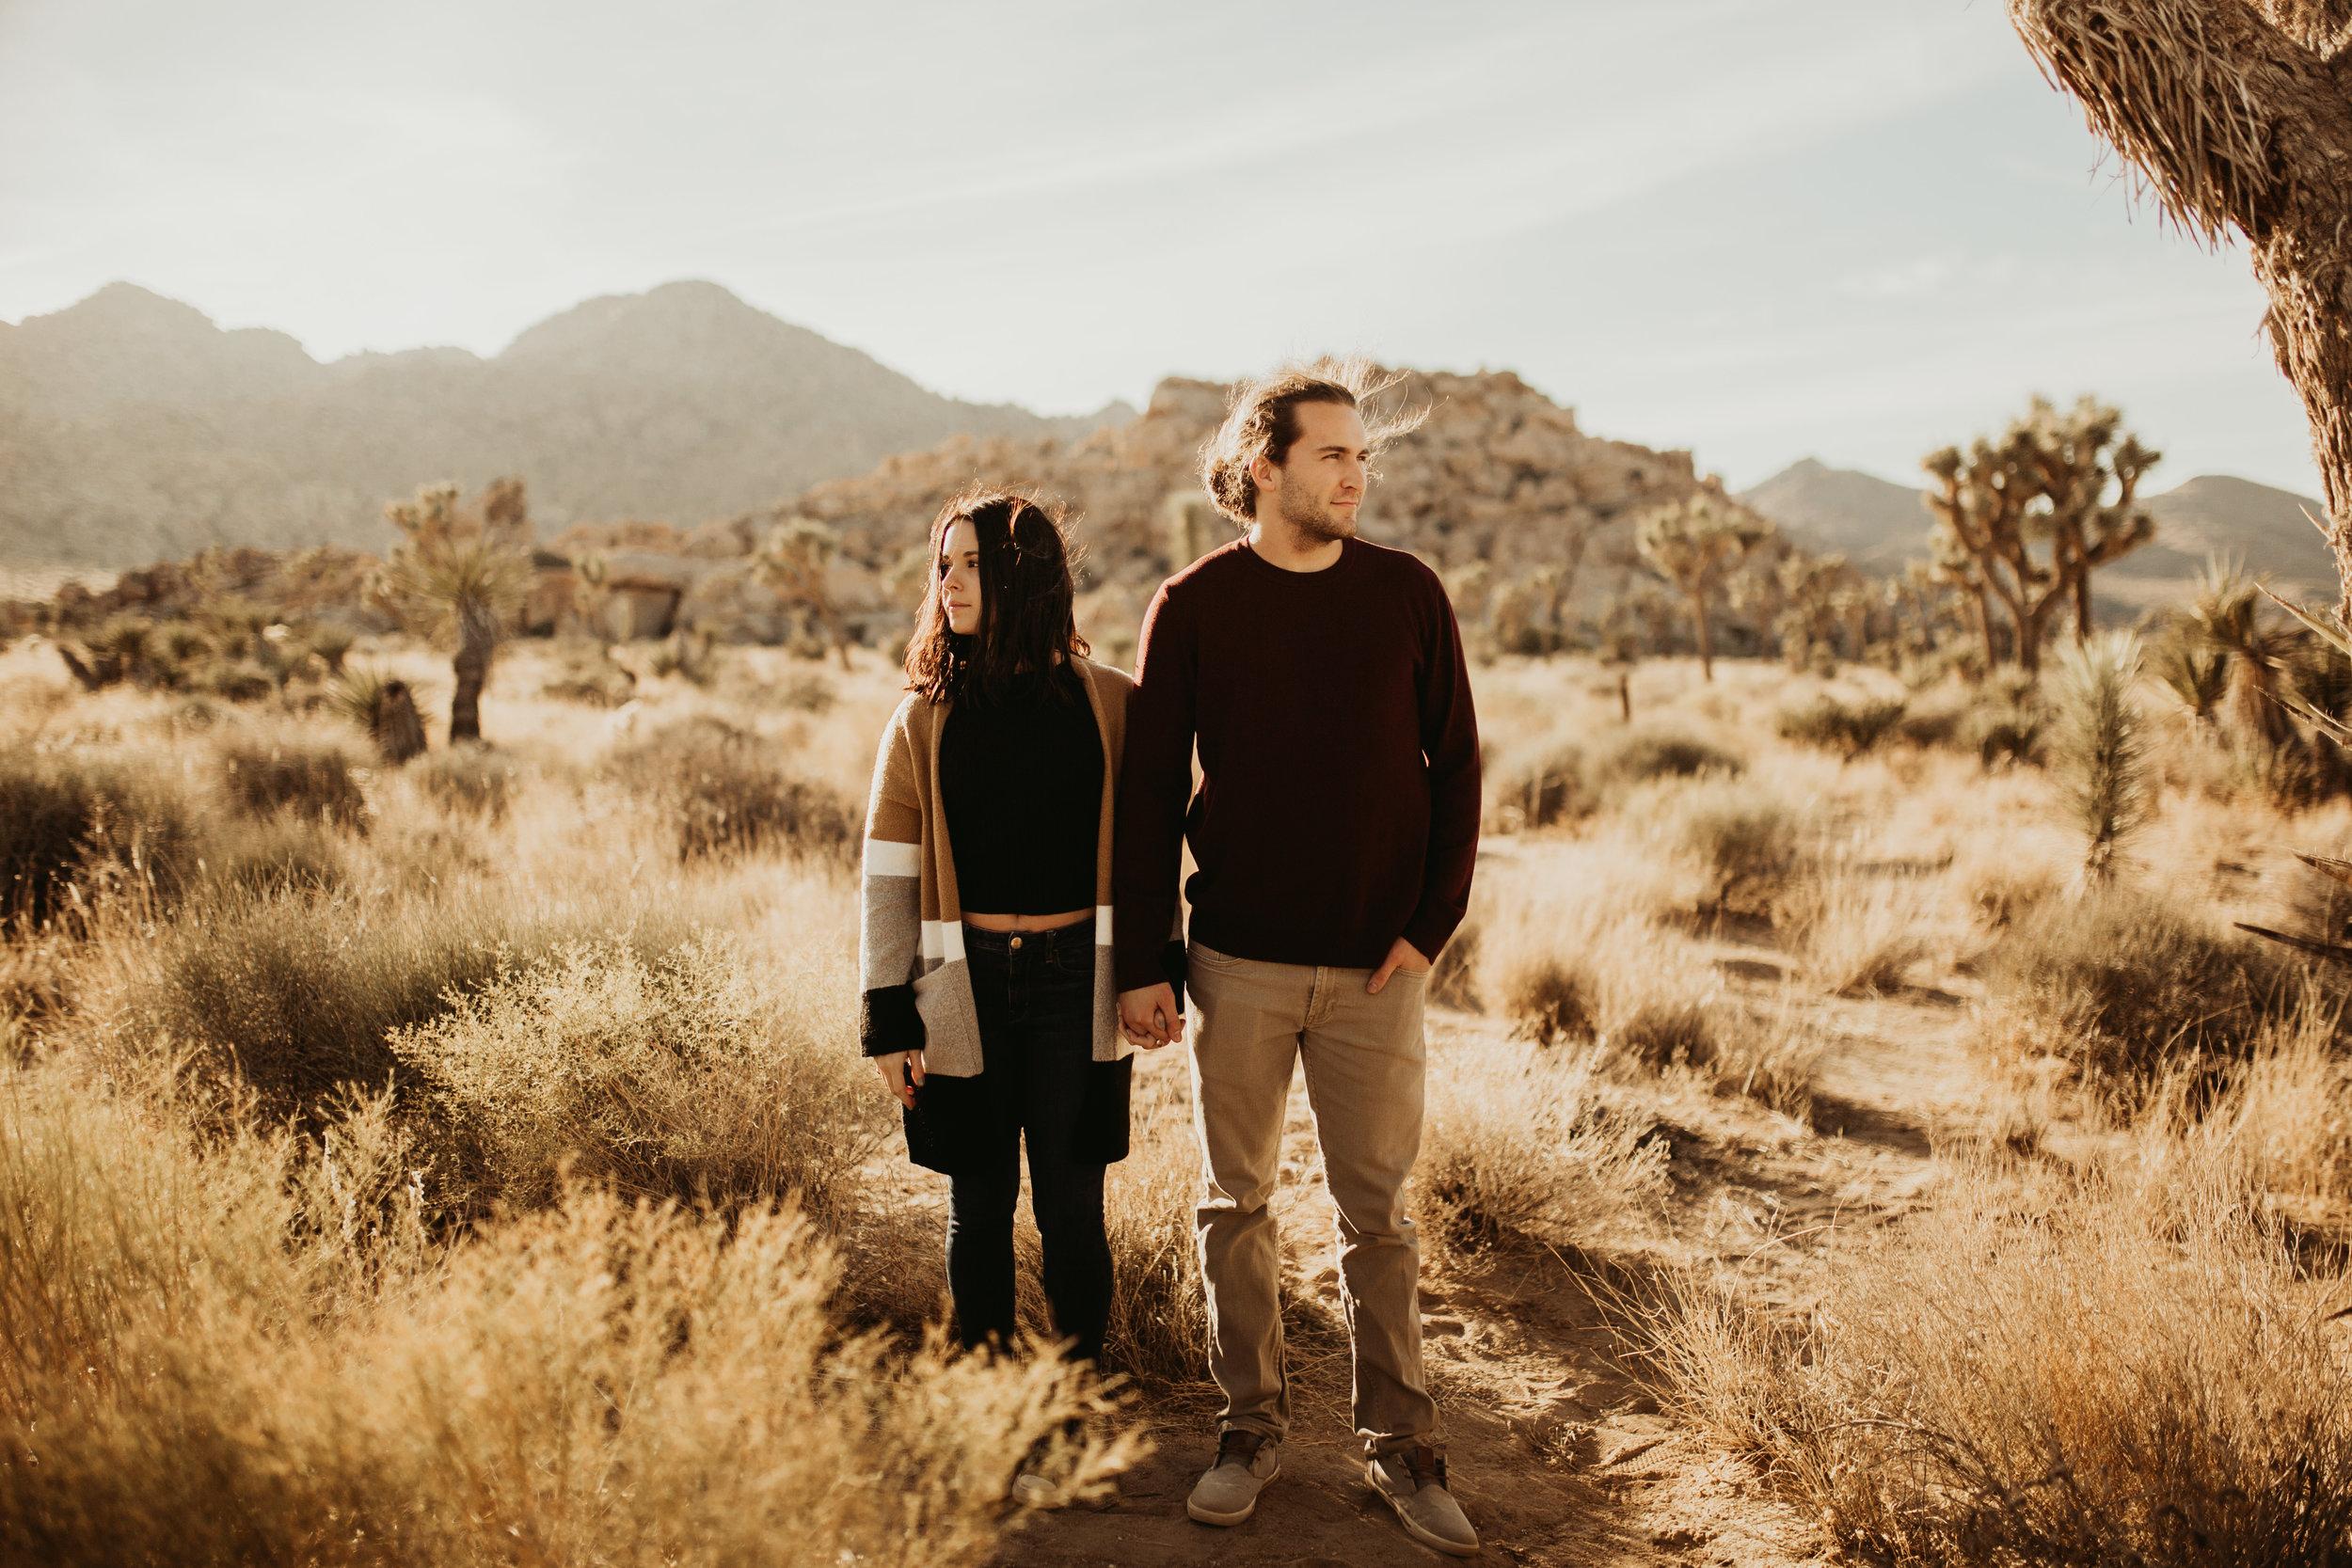 arizona+california+joshuatree+palmsprings+wedding+photographer11.jpg